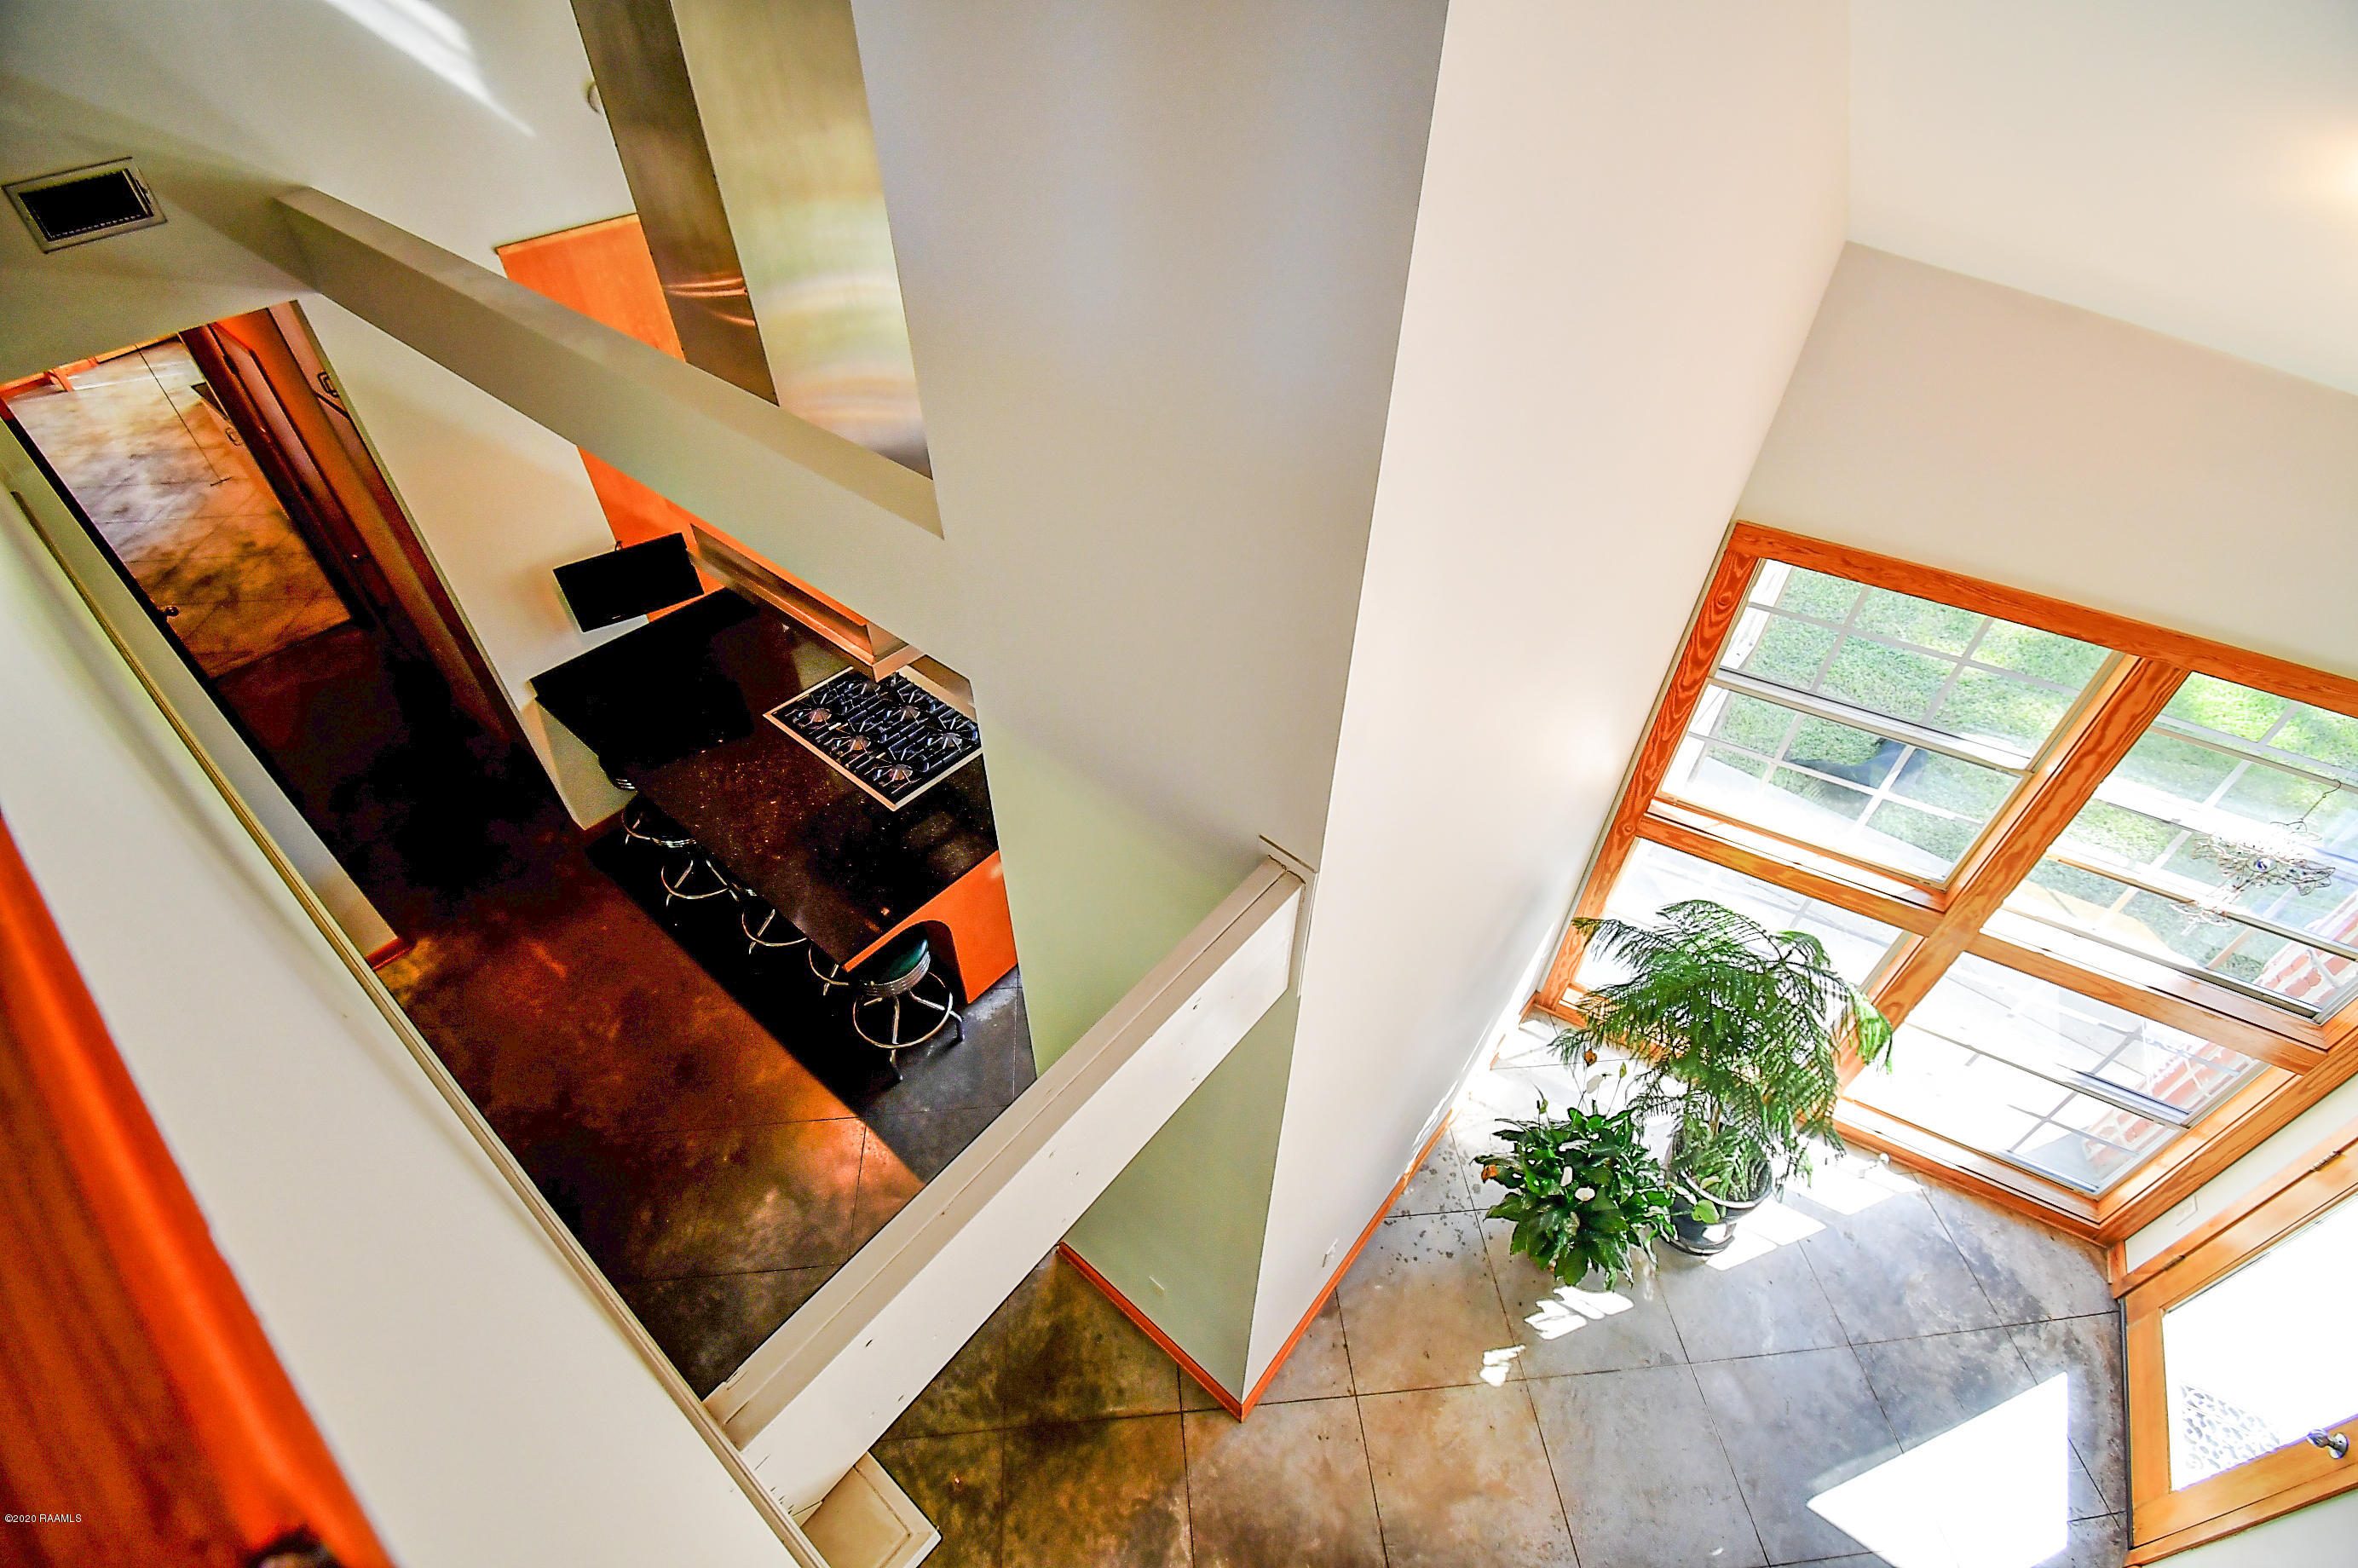 110 Russell Street, New Iberia, LA 70563 Photo #26